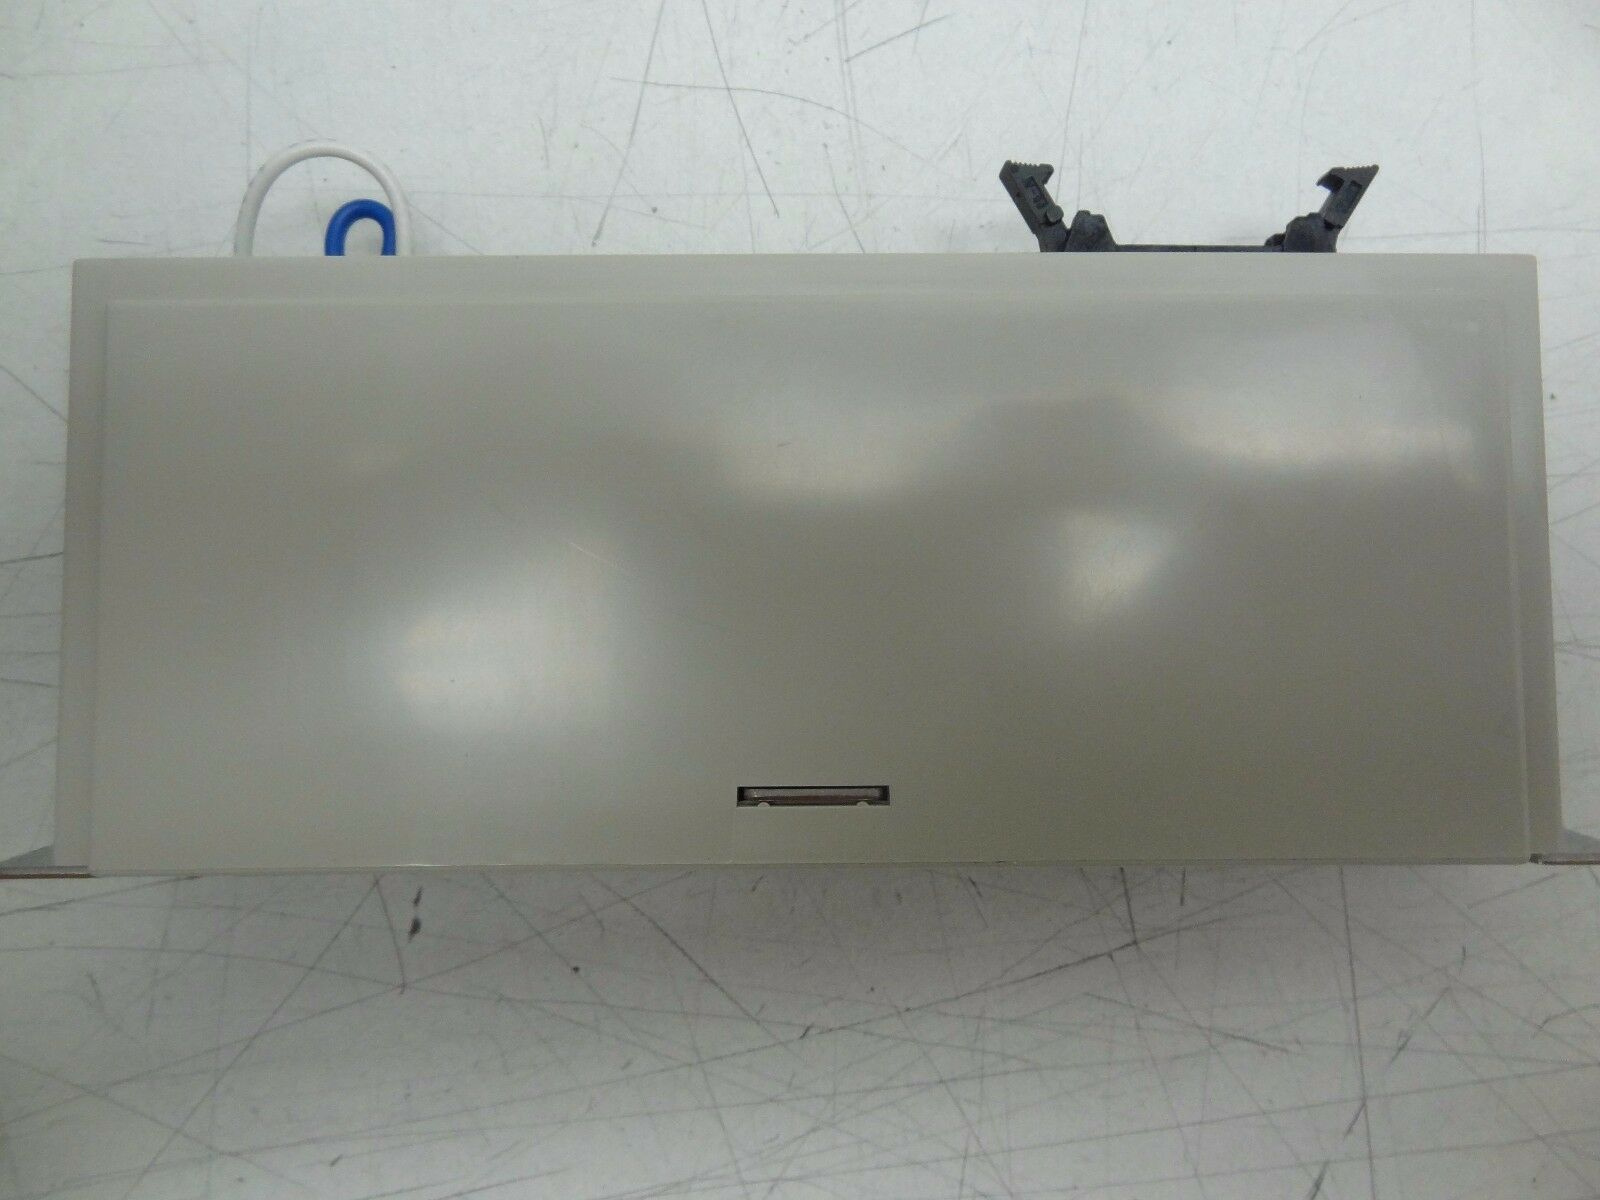 IAI Corporation RCP2 Controlador Controlador Controlador de cilindro de robo RCP2-C - rmgs-I-PM-0 74ee8d